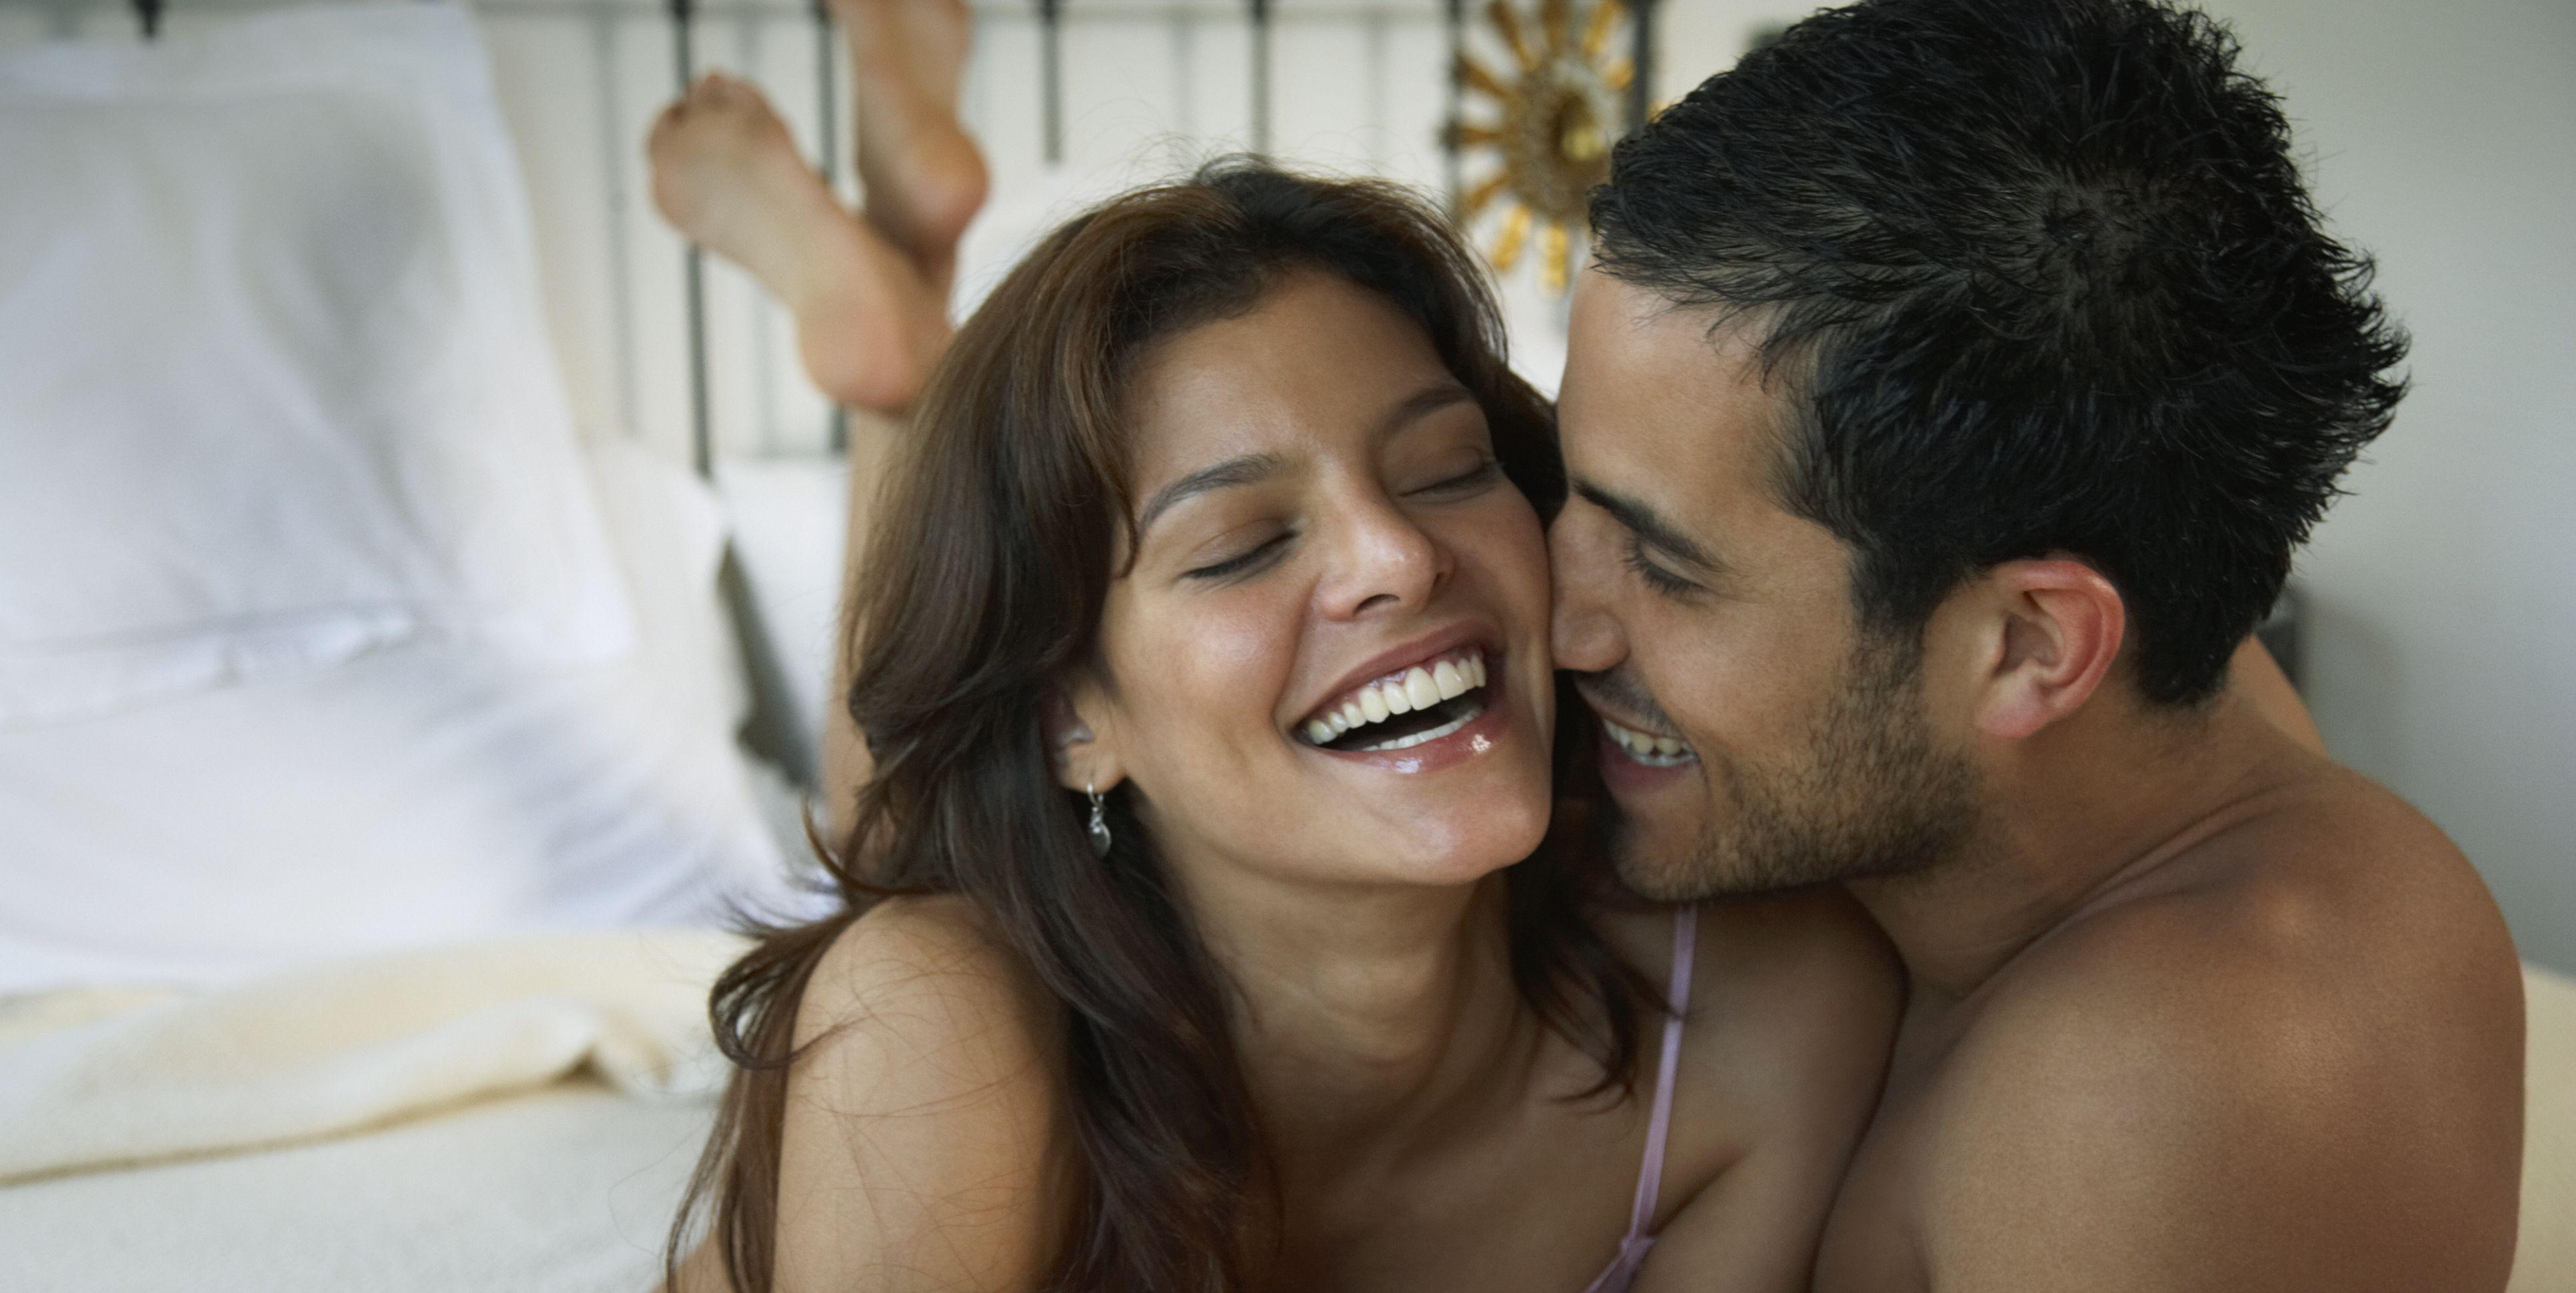 Hispanic couple laughing on bed